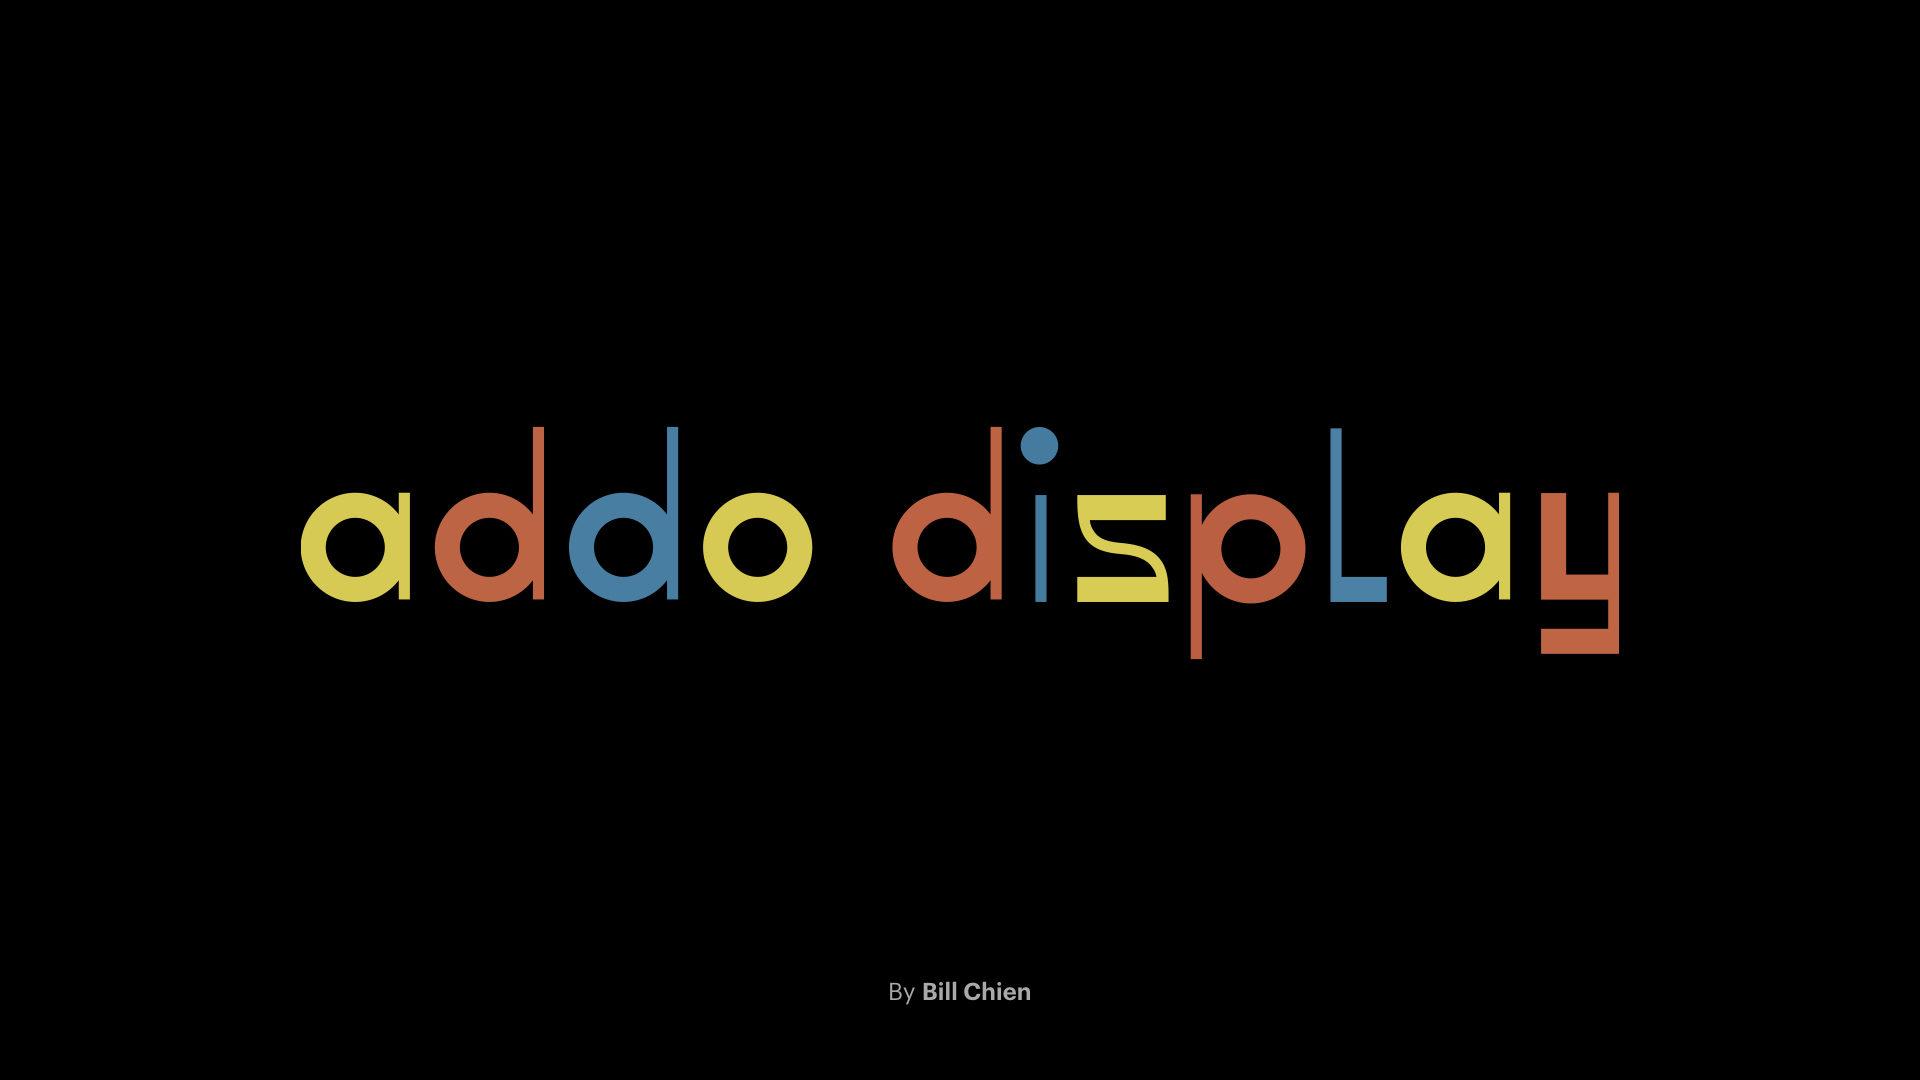 add display custom typeface designed by Bill Chien